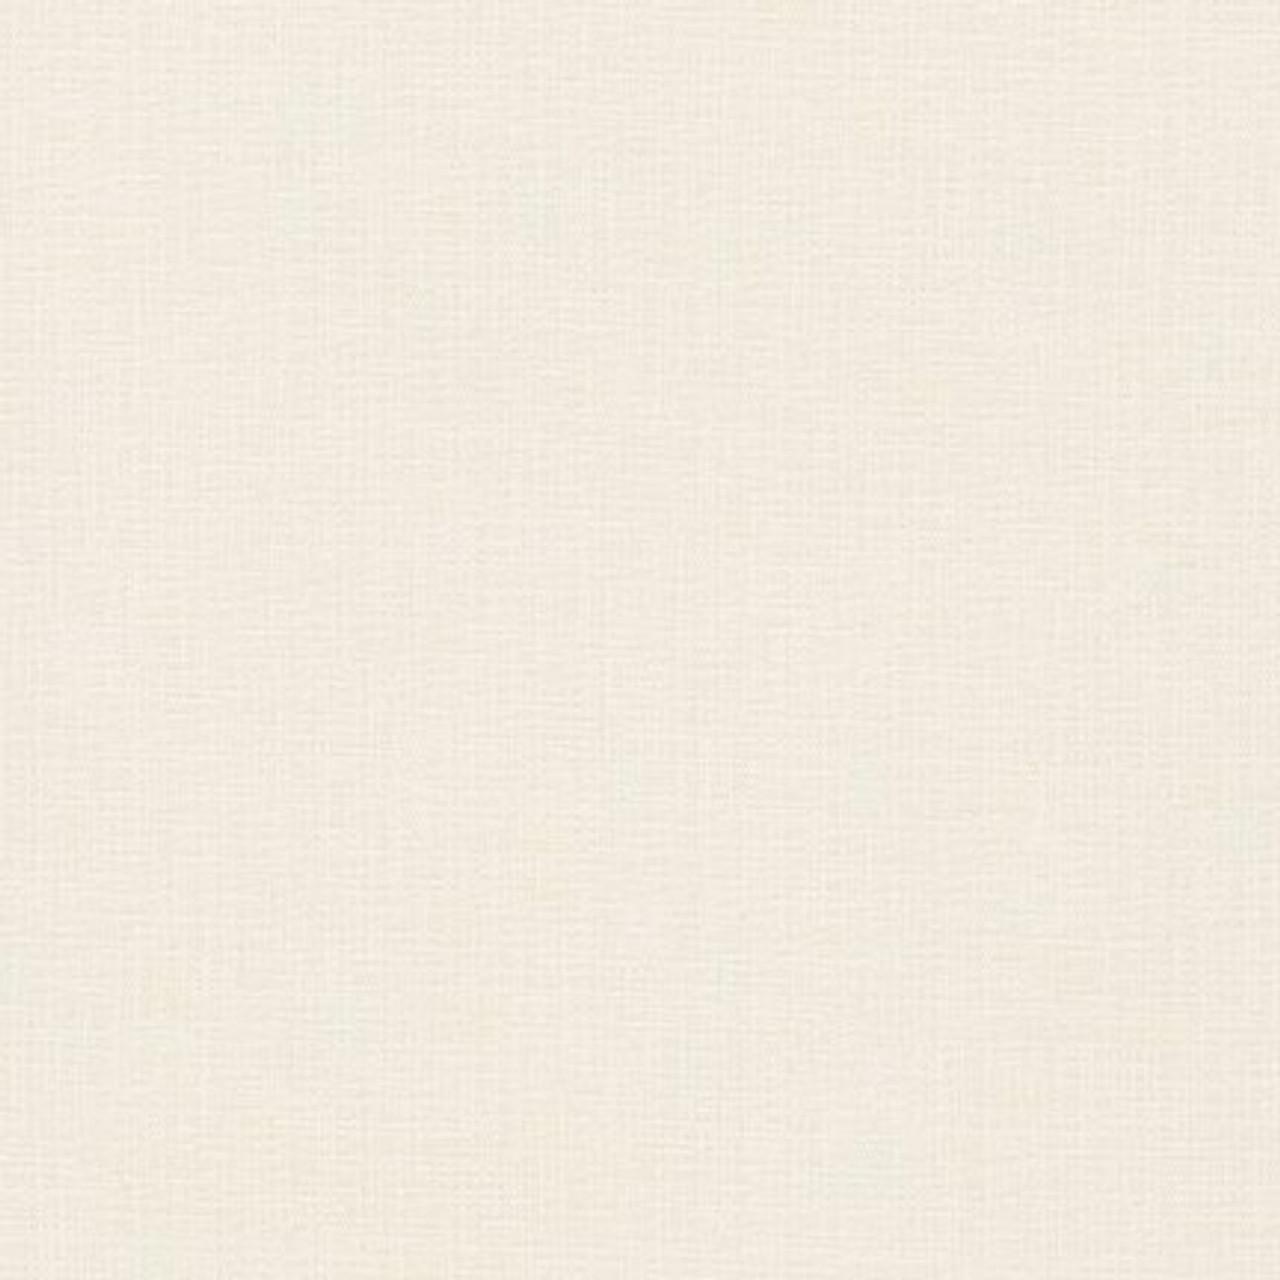 100% Cotton linen look - SNow